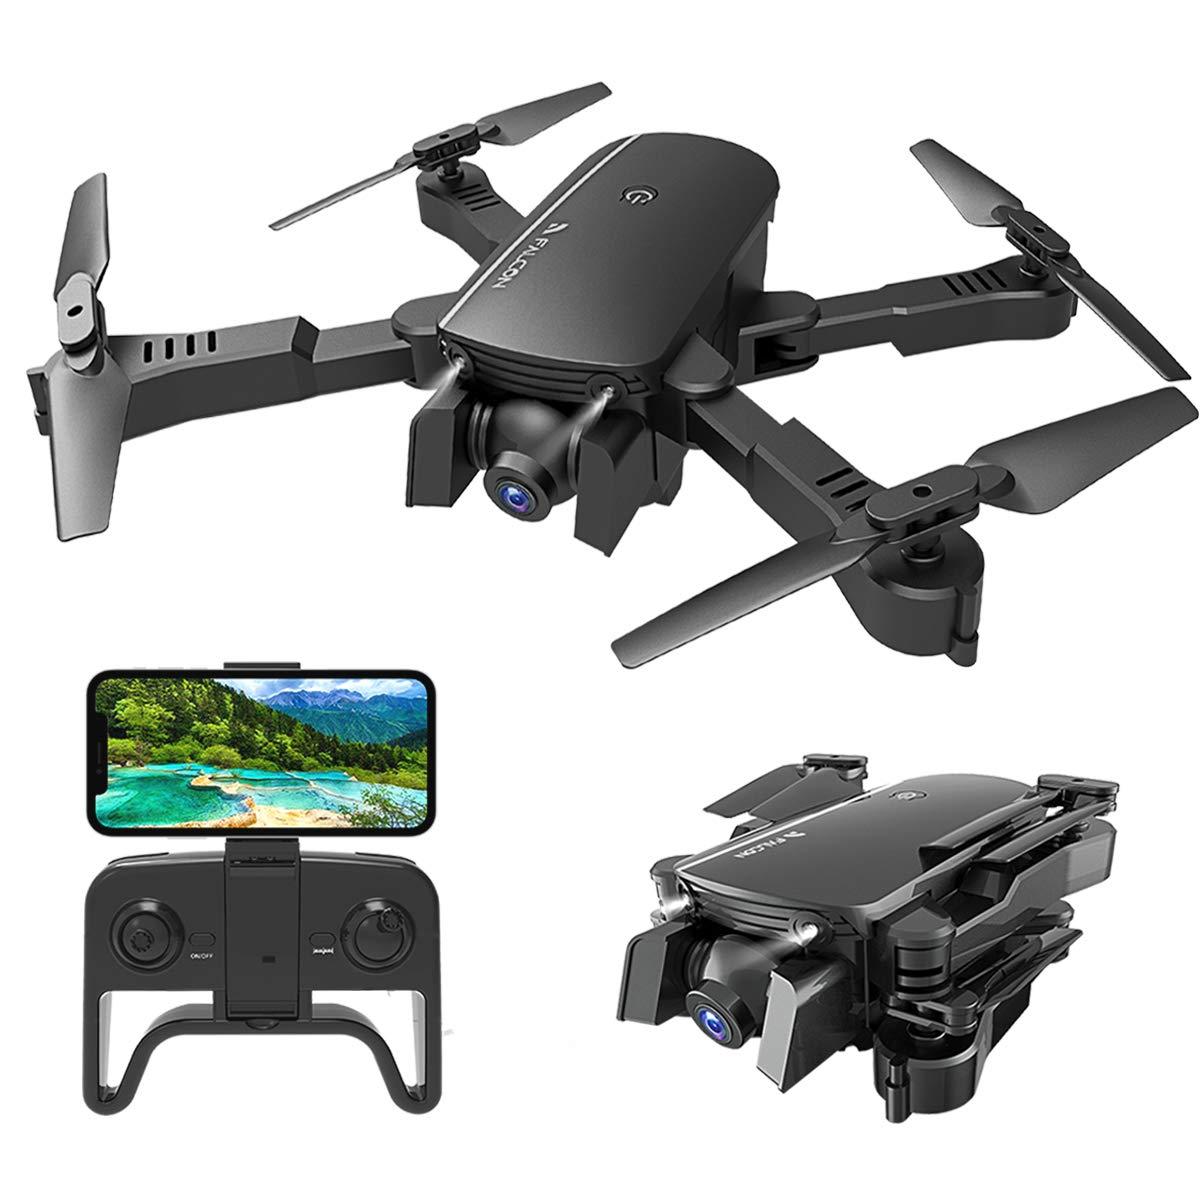 Foldable Quadcopter Beginners Altitude Headless